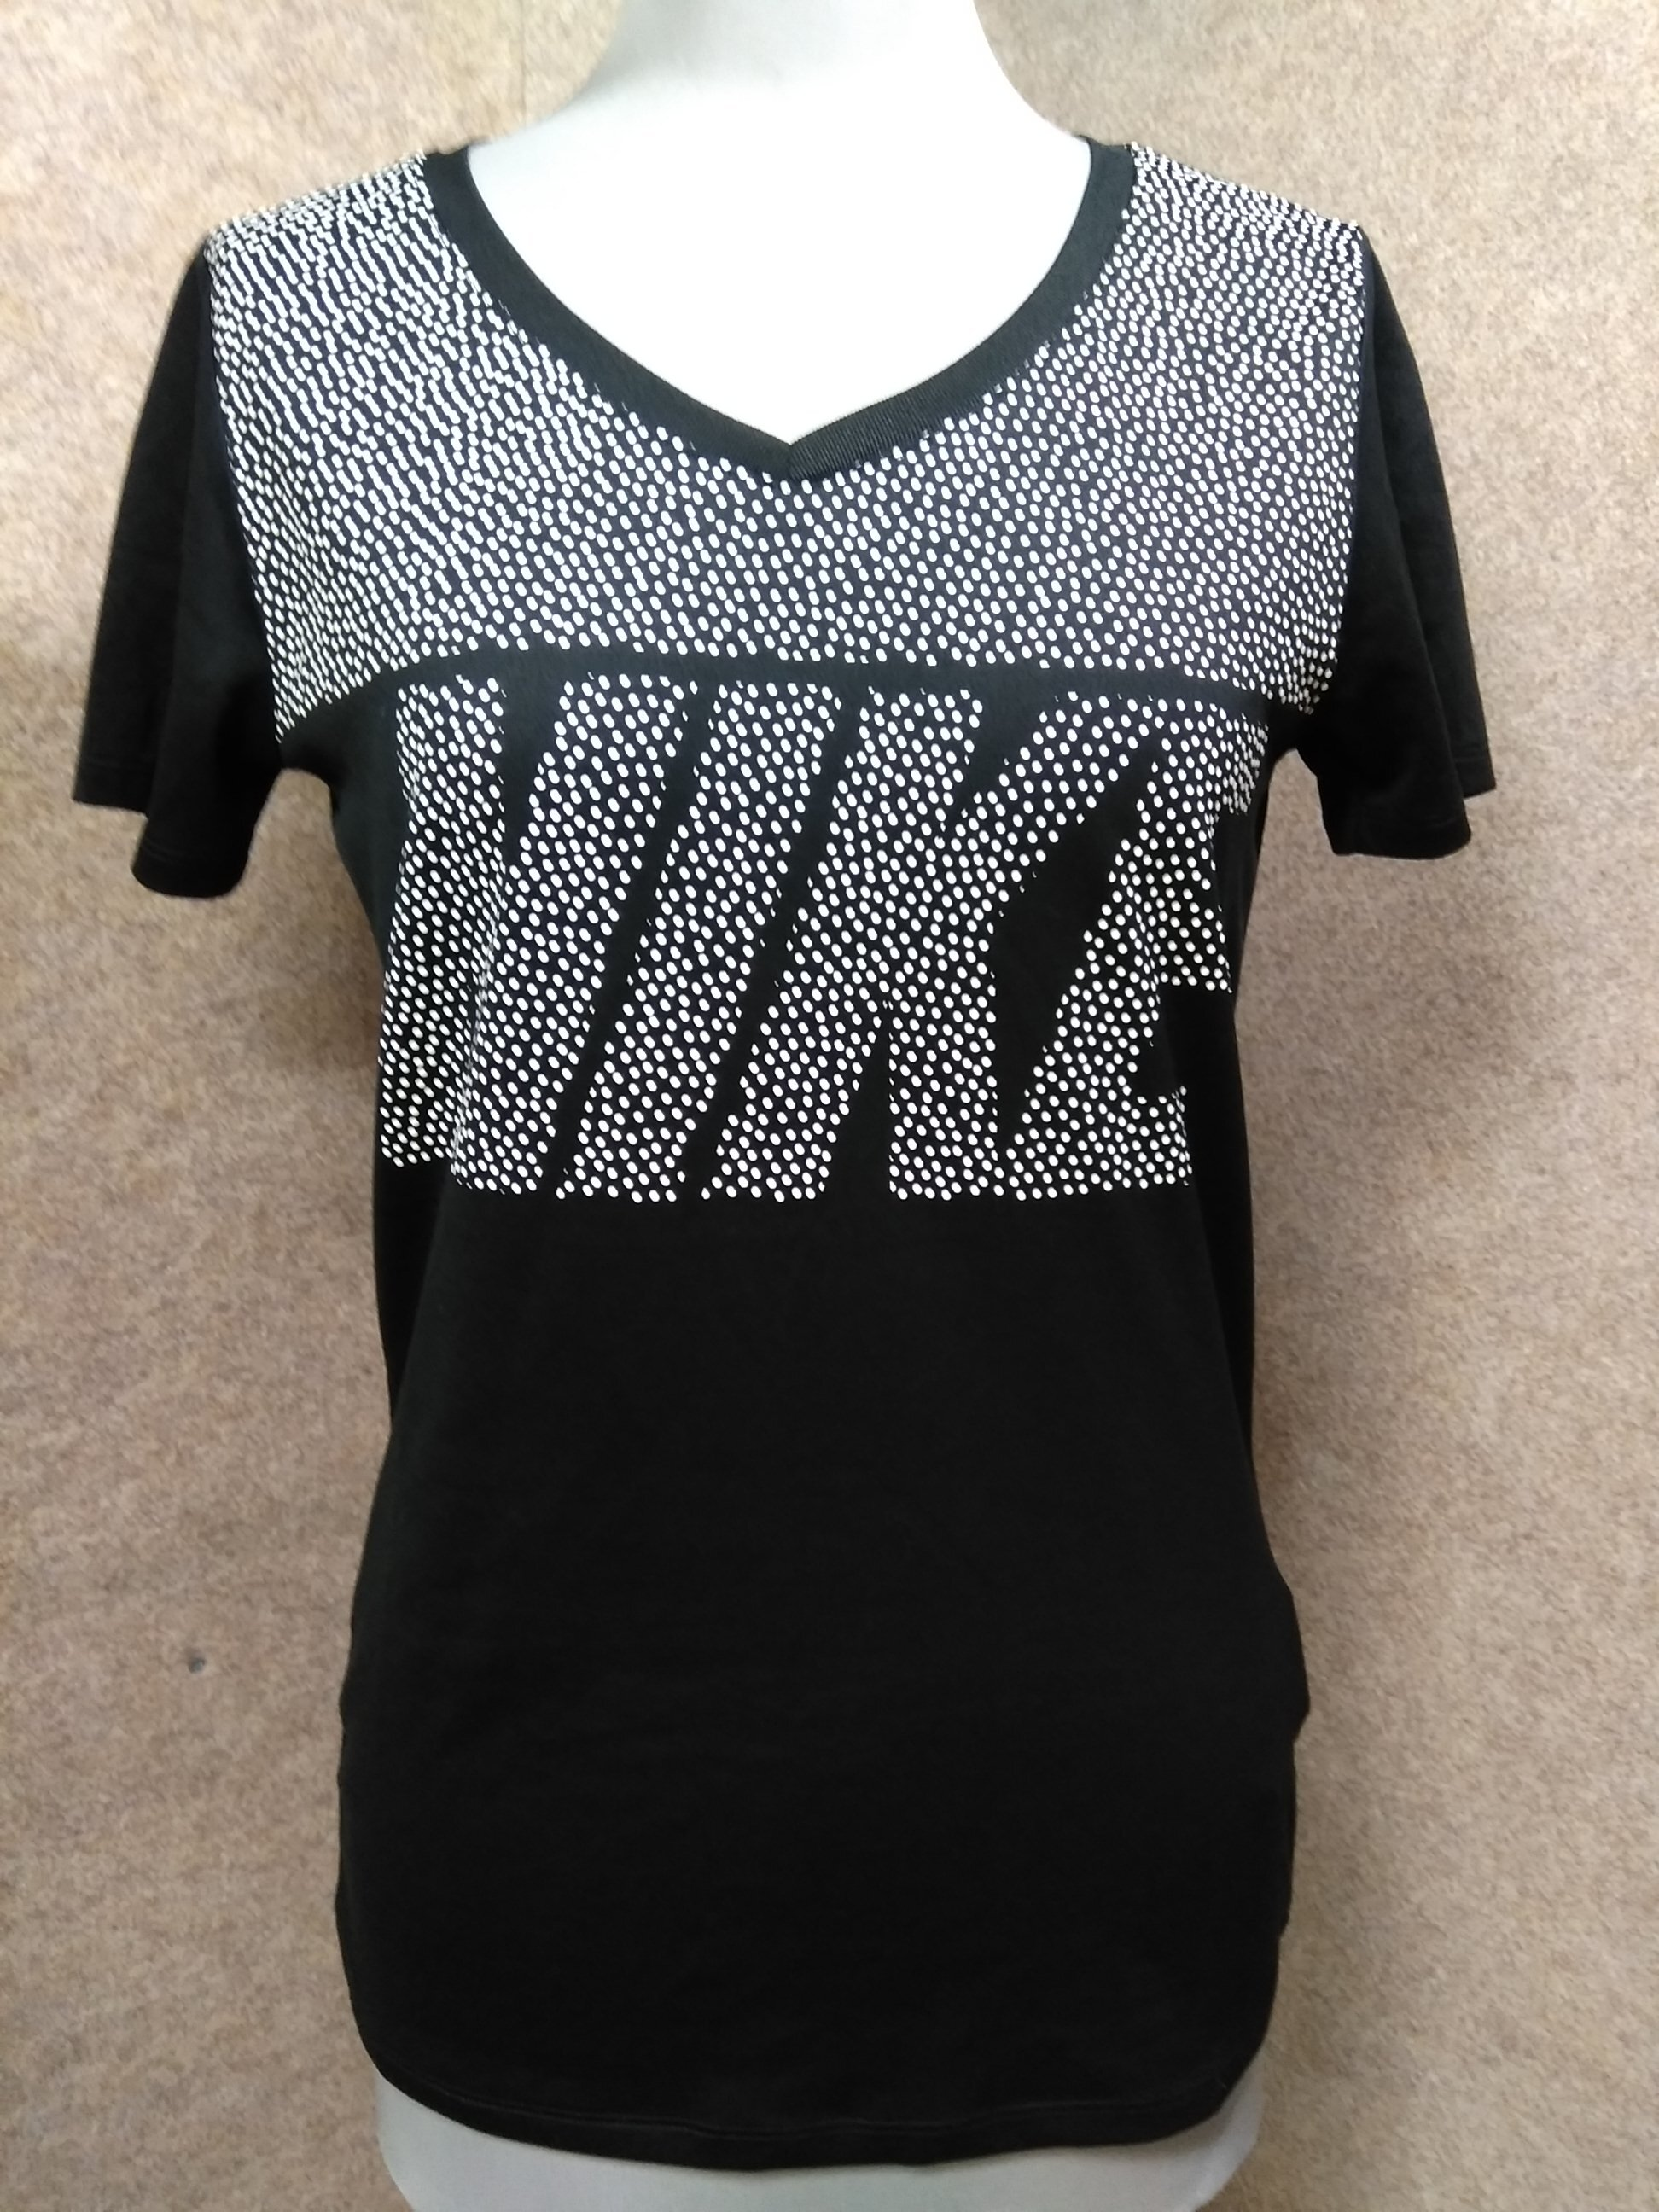 NIKE ナイキ レディース Tシャツ M 黒 u1282a